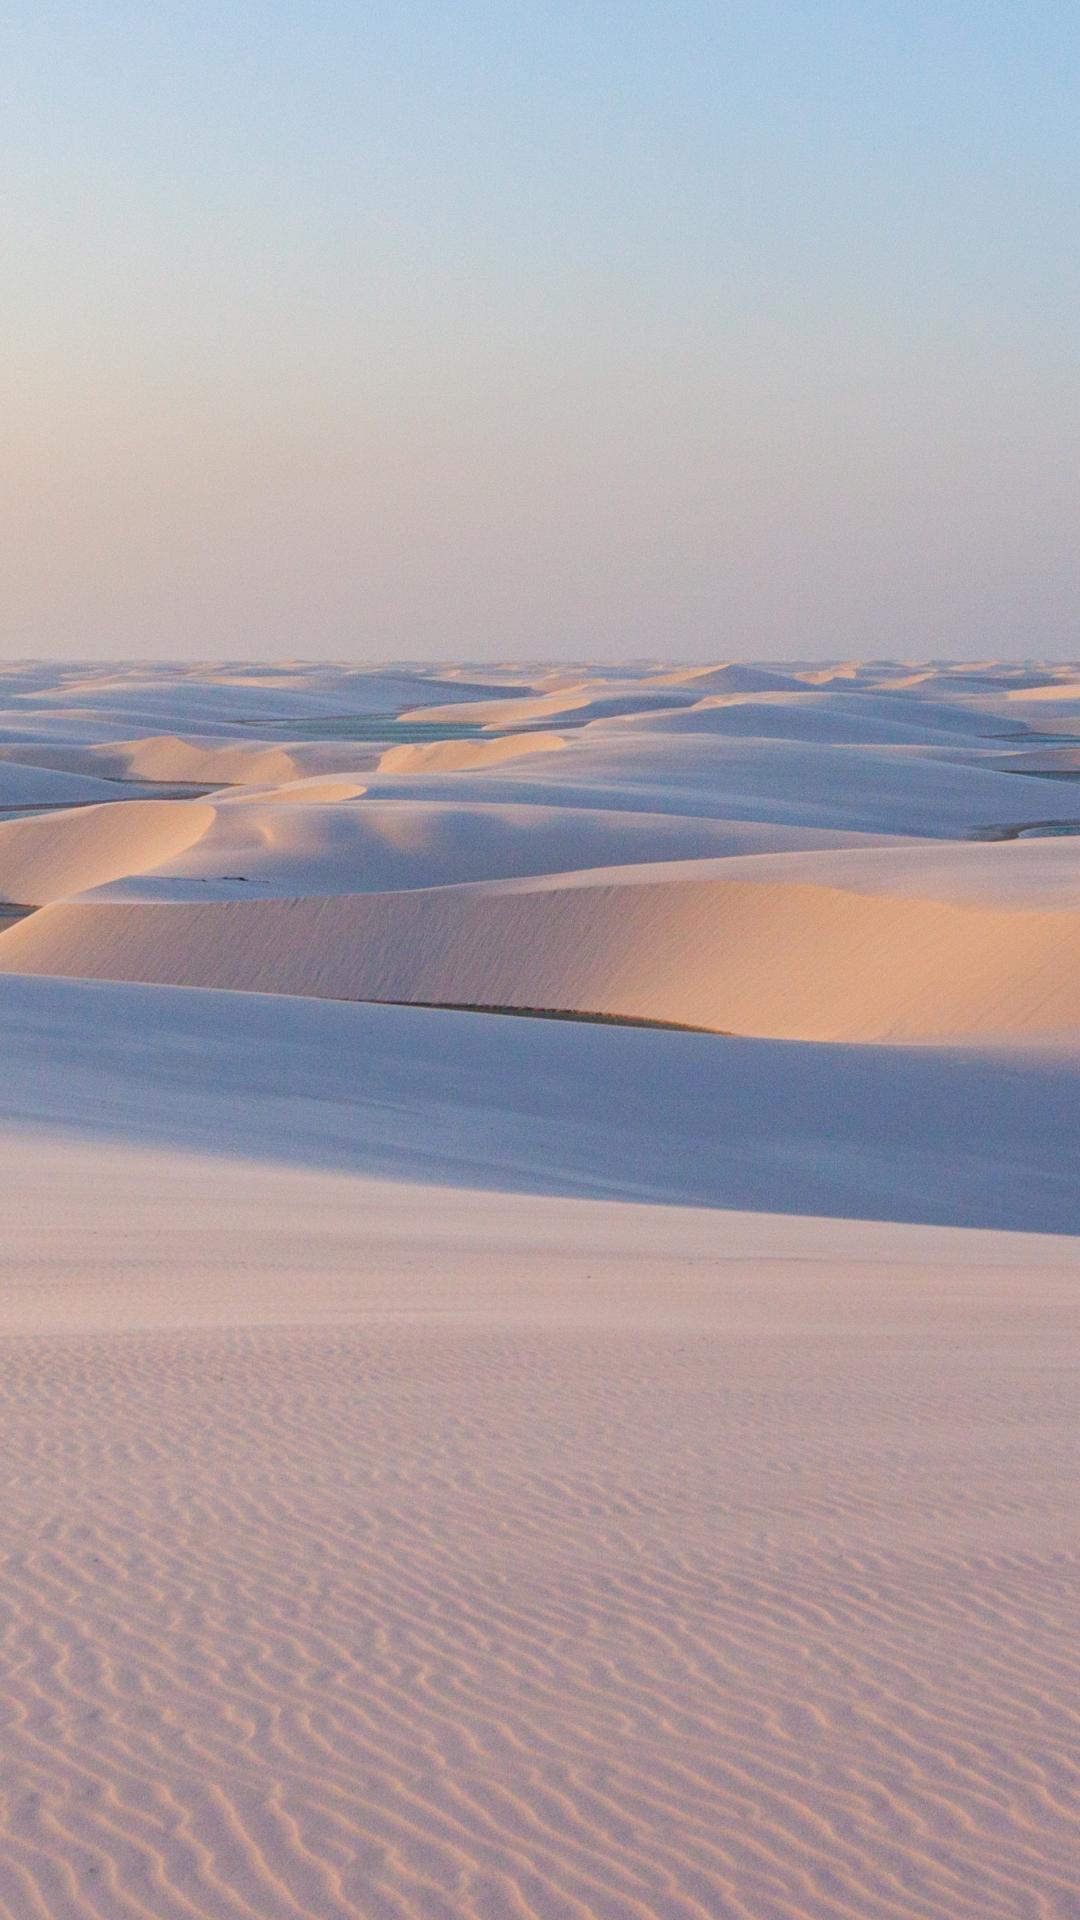 Sand And Desert iPhone Wallpaper